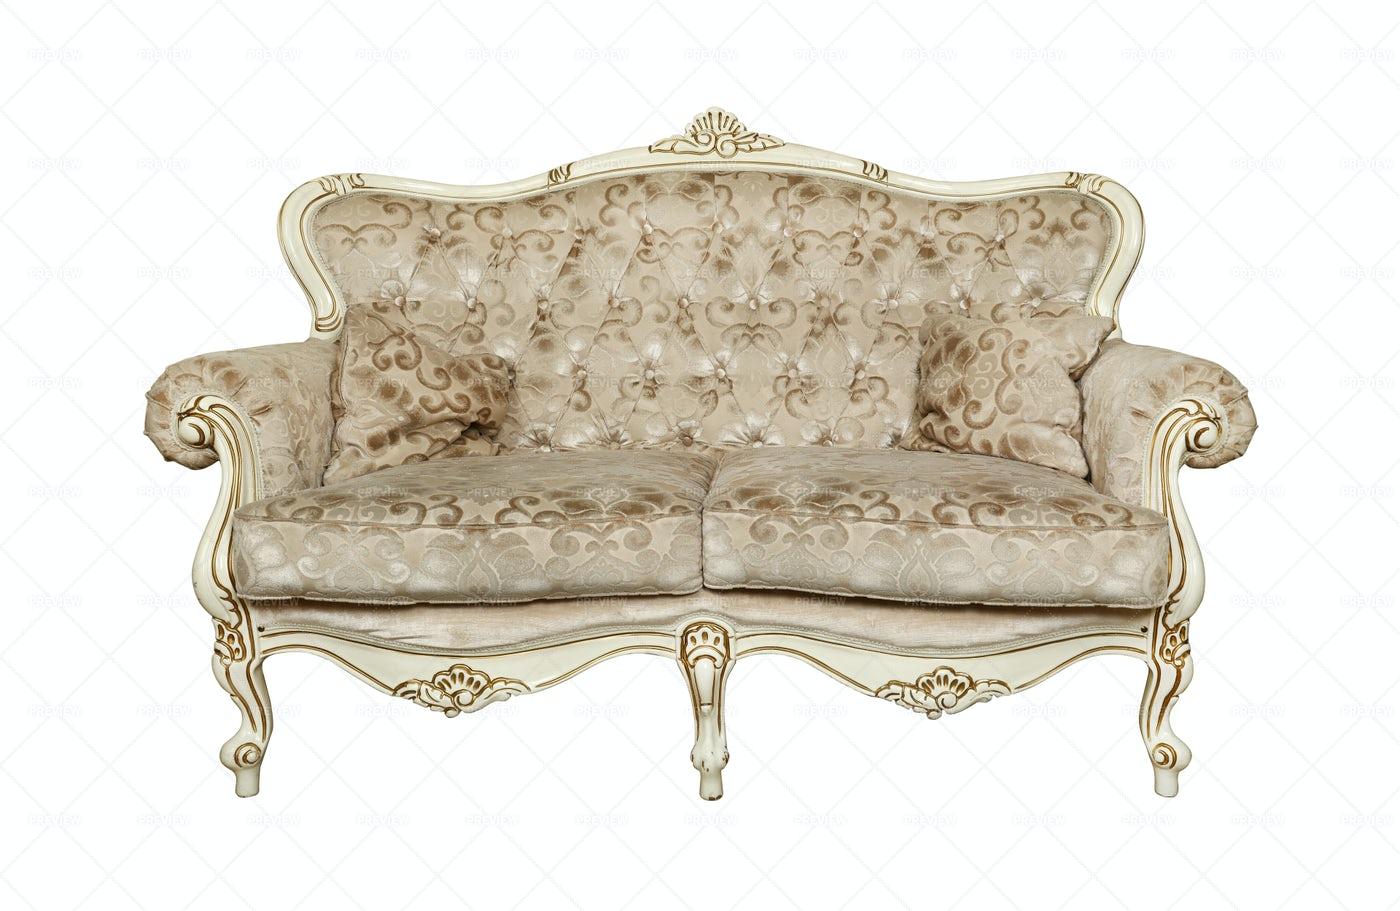 White Tufted Chesterfield Sofa: Stock Photos